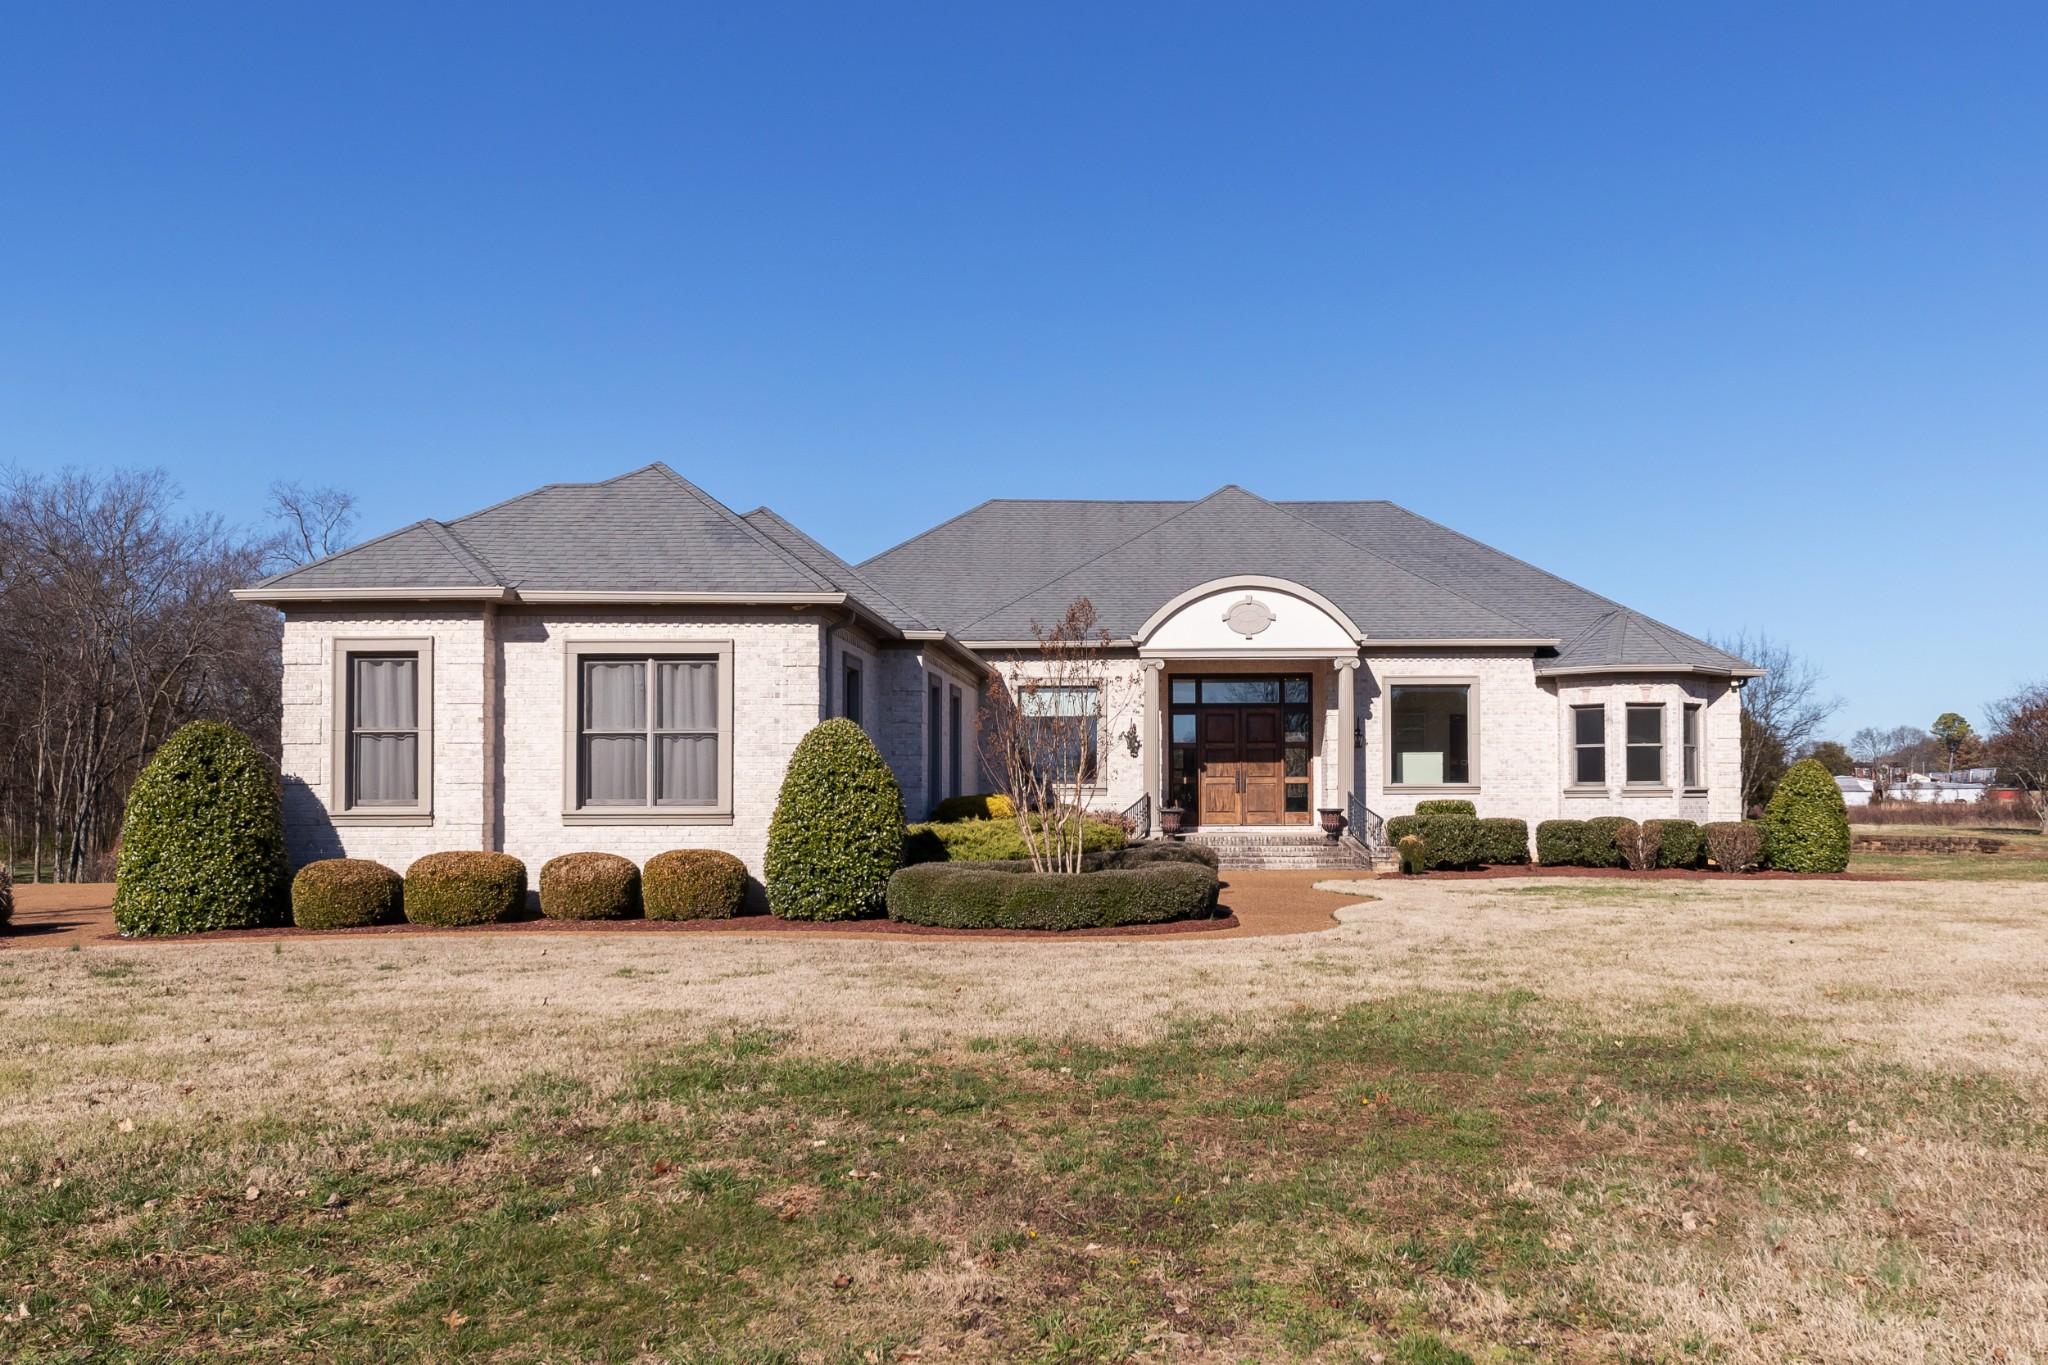 7706 Bridlewood Dr, Christiana, TN 37037 - Christiana, TN real estate listing